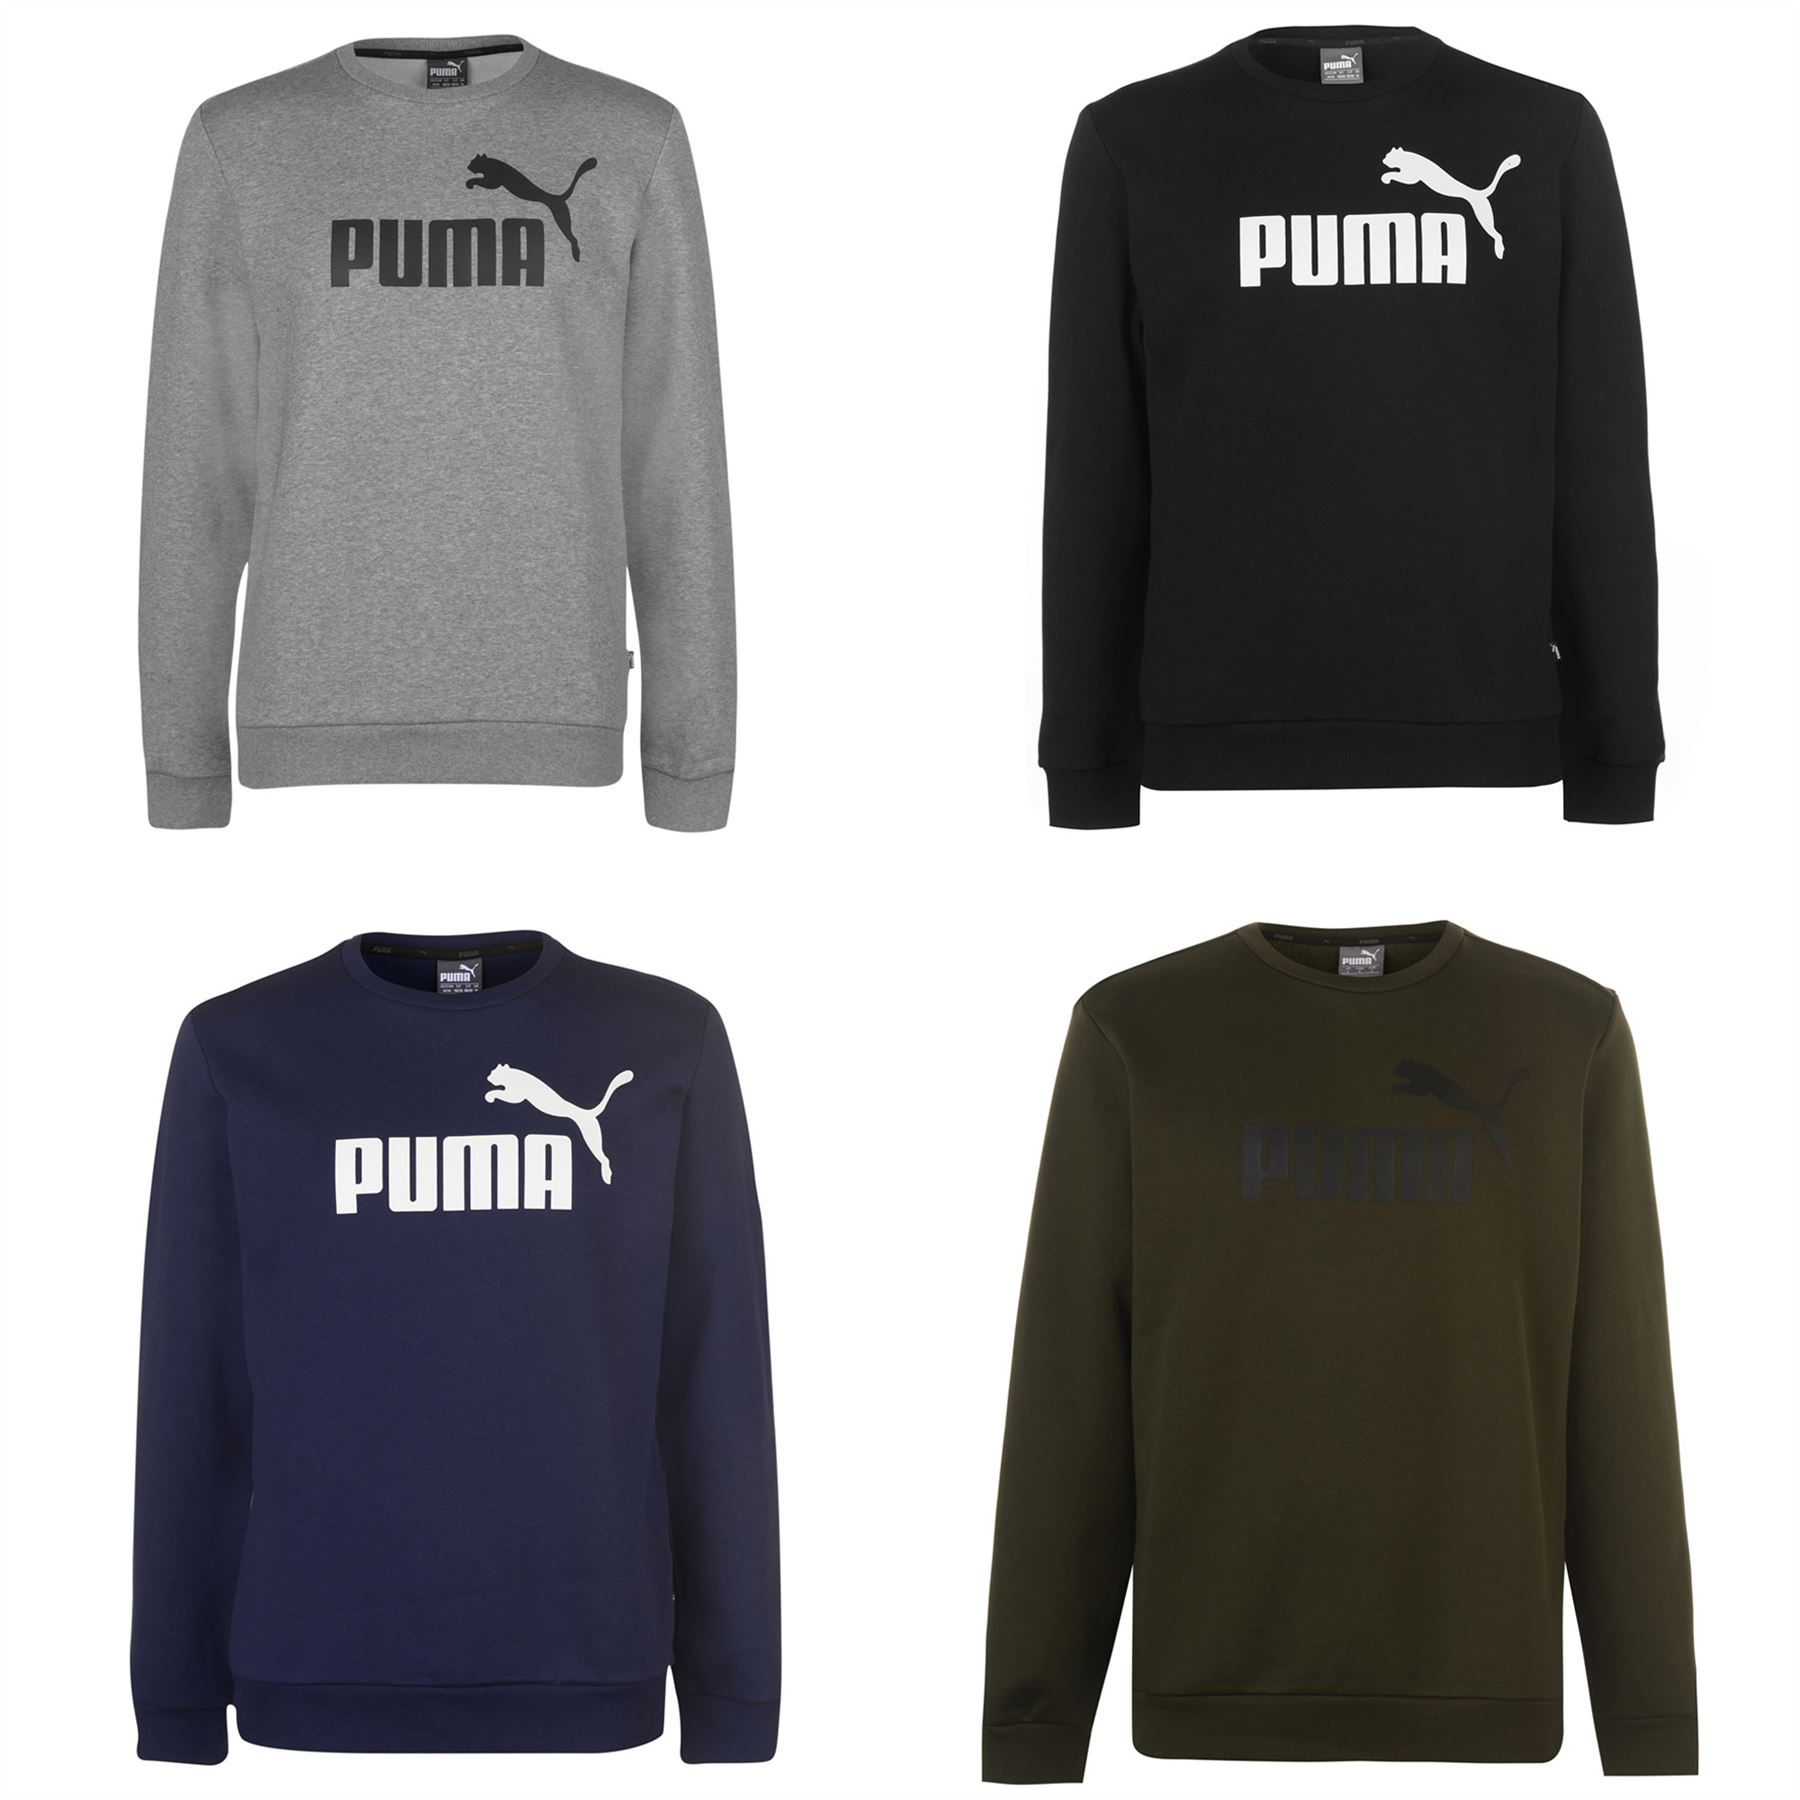 Puma No1 Crew Pullover Mens Gents Jumper Full Length Sleeve Neck Warm Stamp